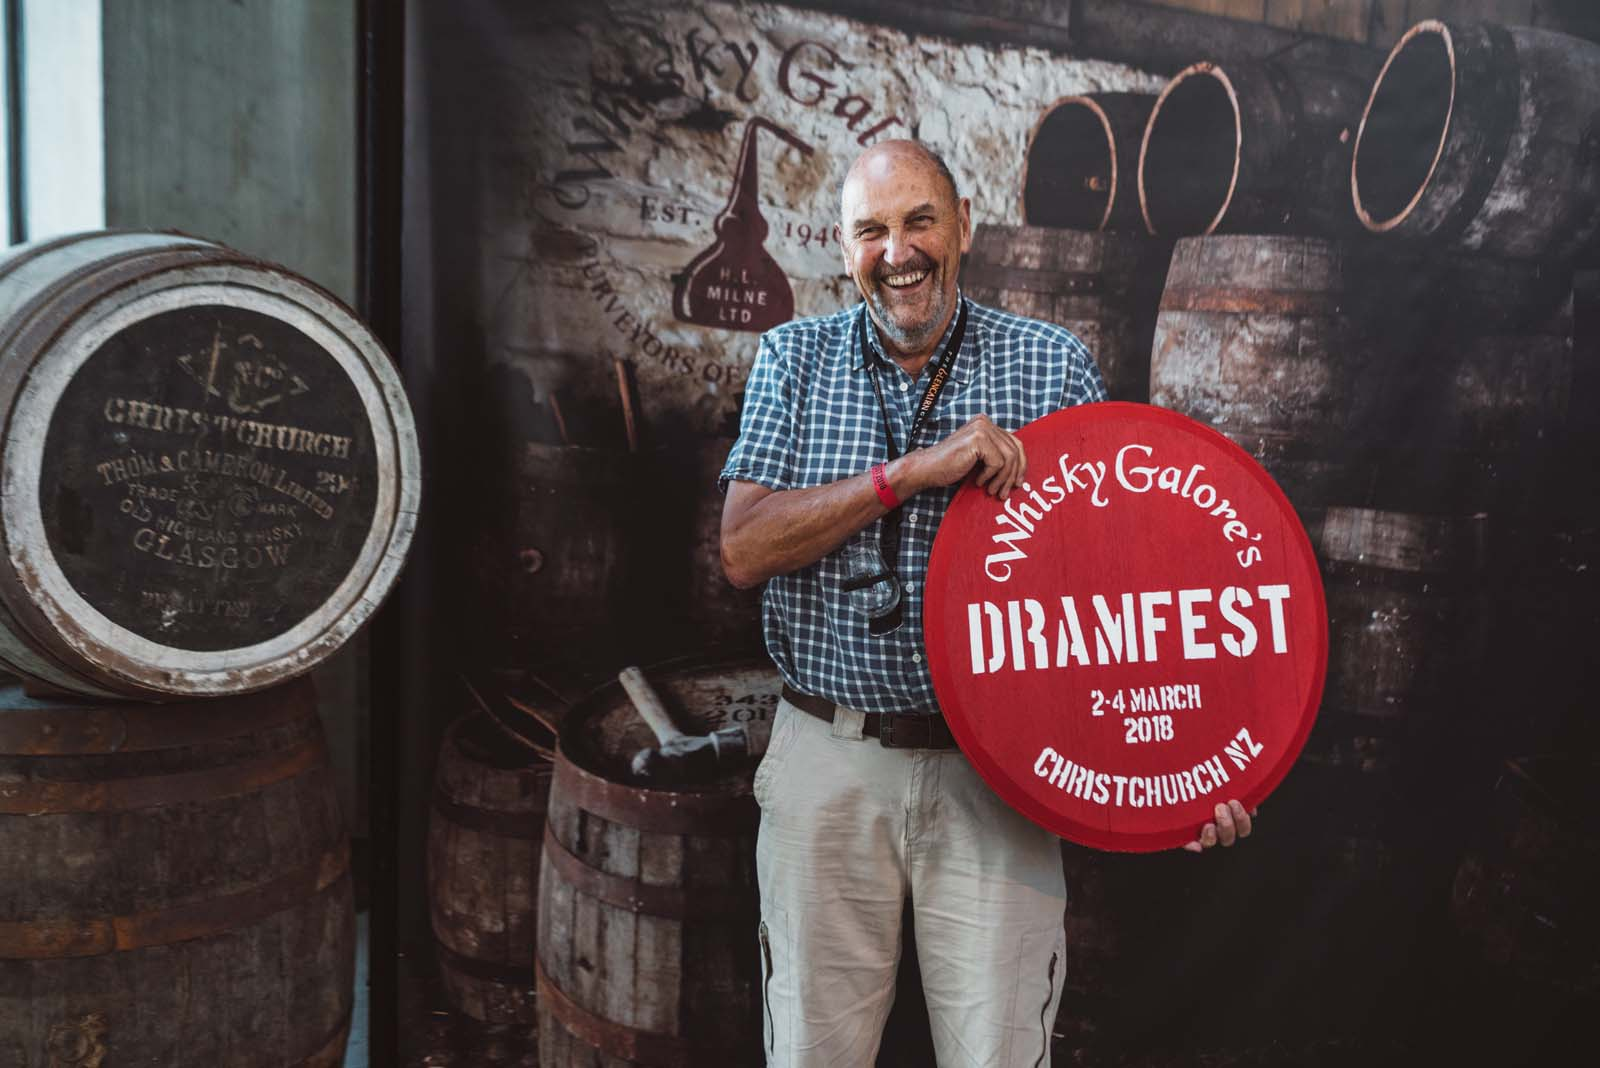 Dramfest 2018 for Whisky Galore-8.jpg